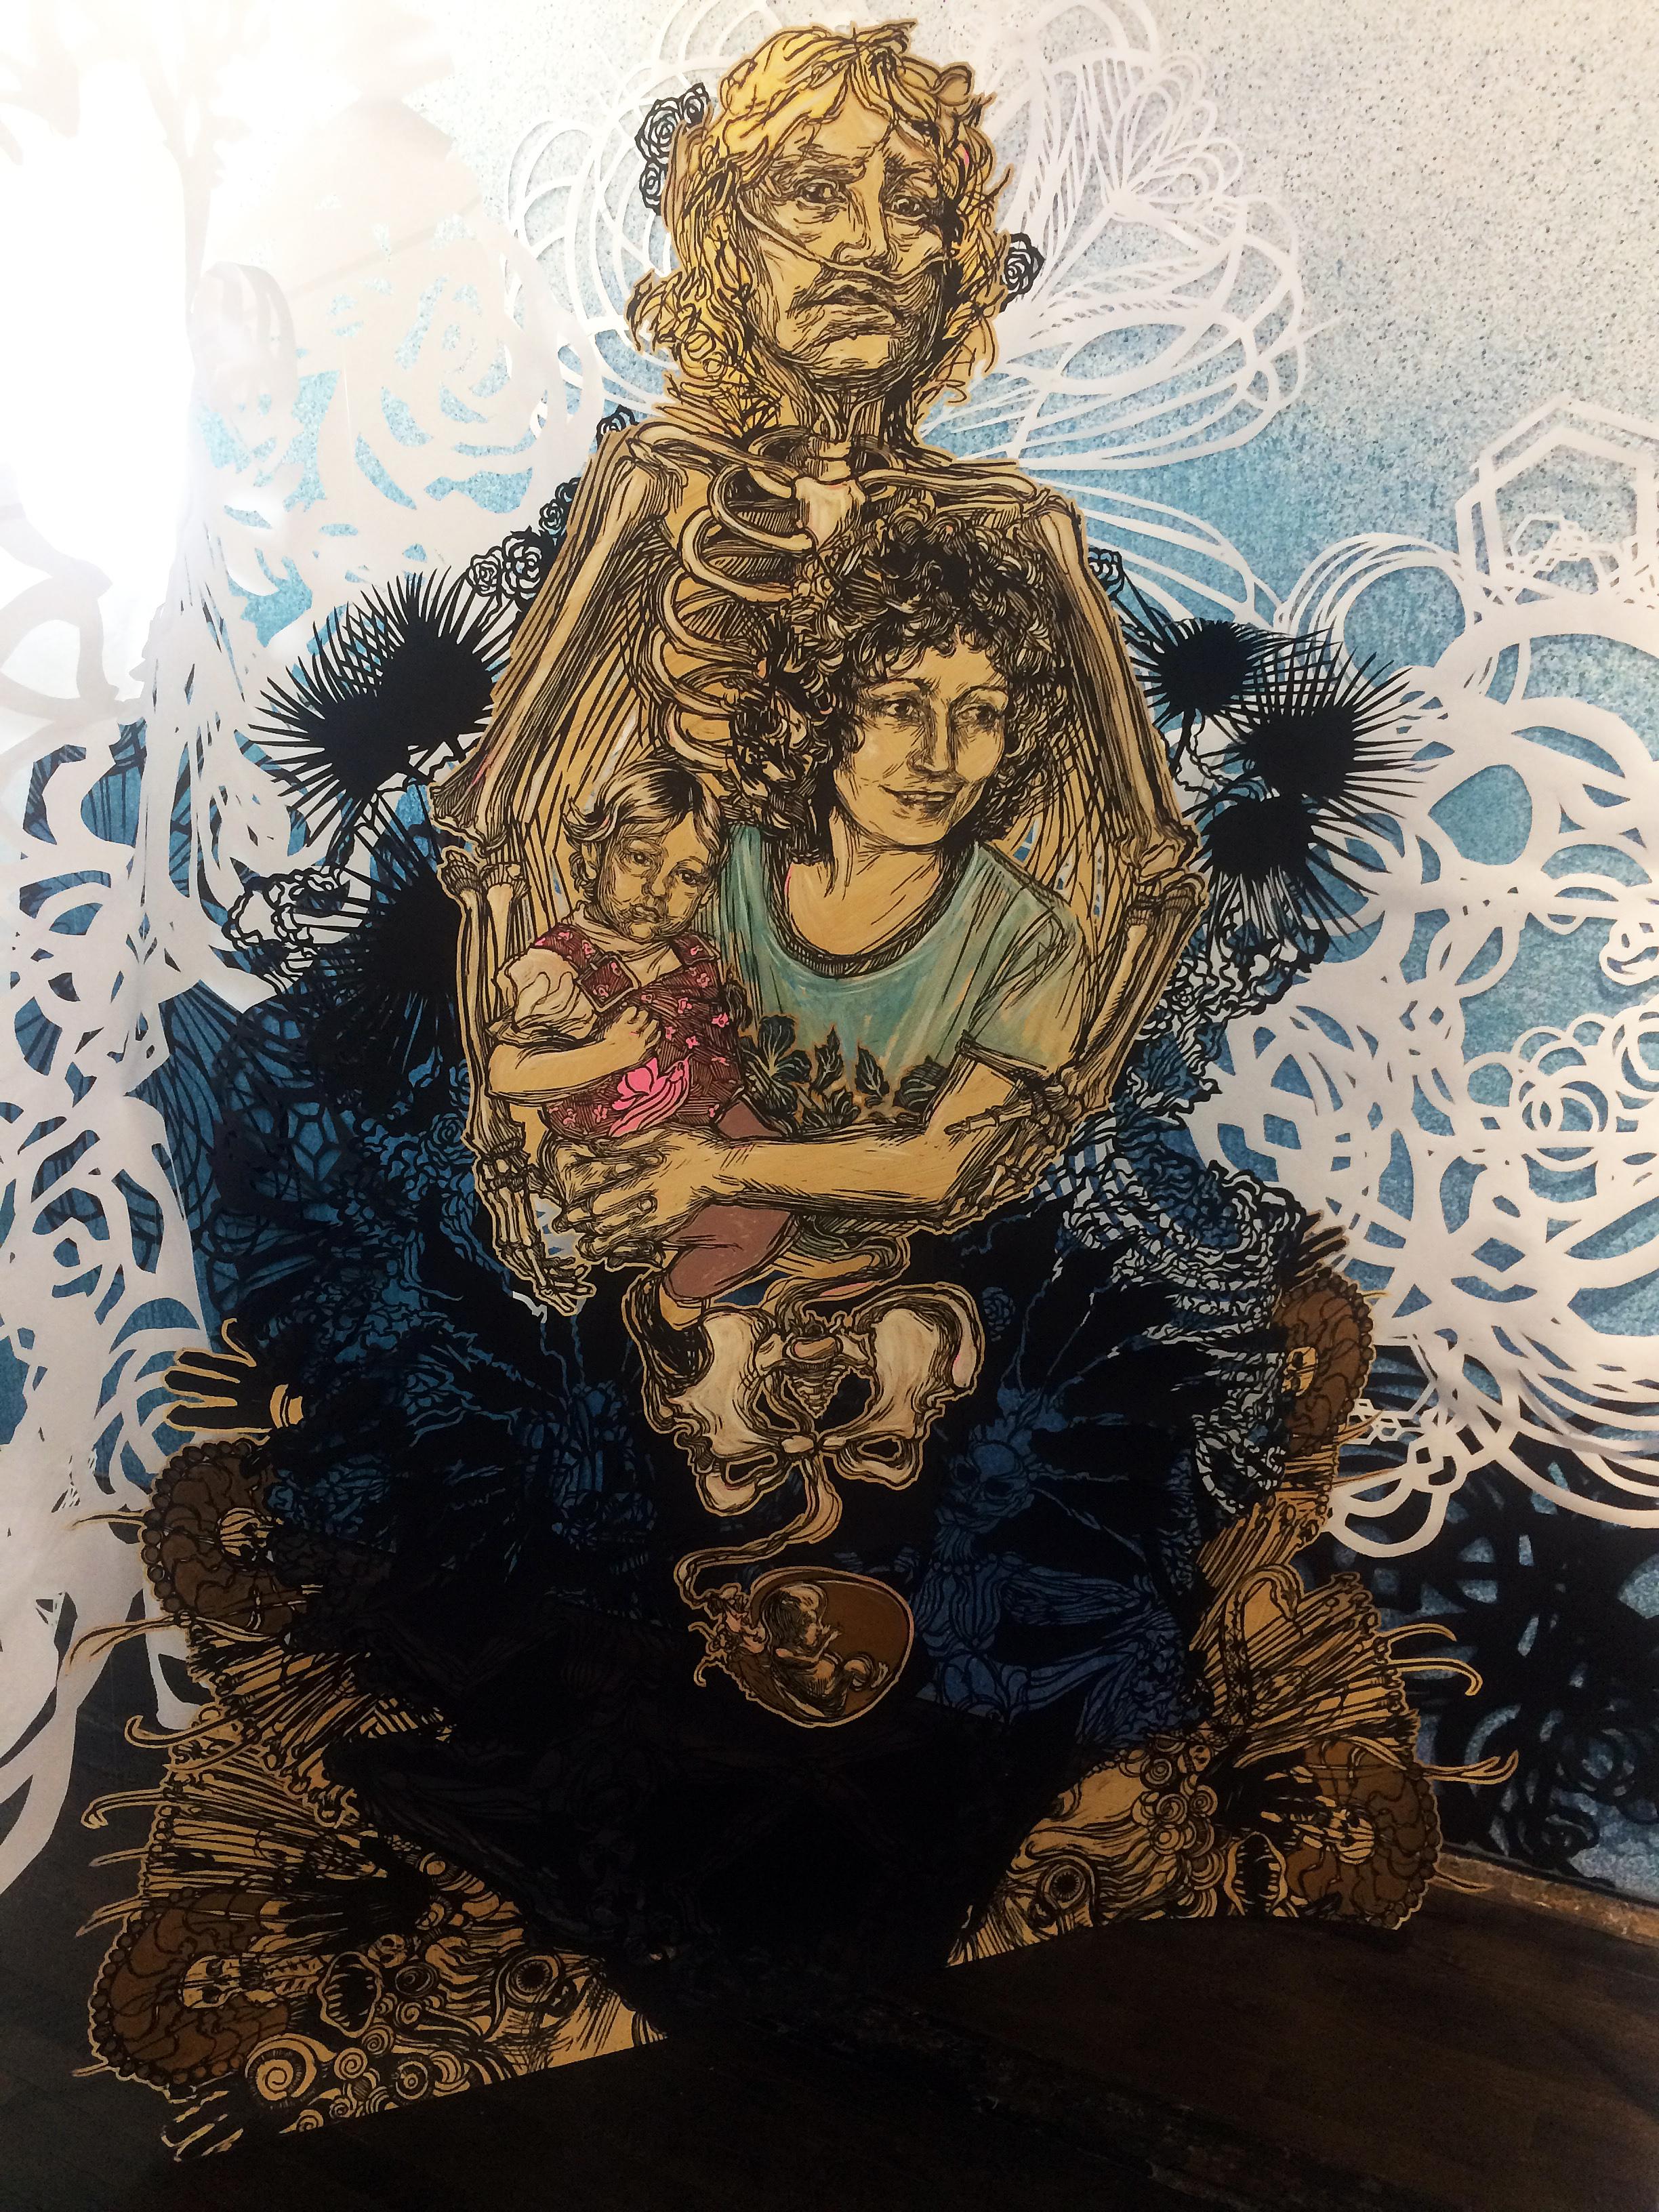 image-2-swoon-memento-mori-2016-block-print-on-hand-cut-mylar-edition-3-of-12-84-x-67-in